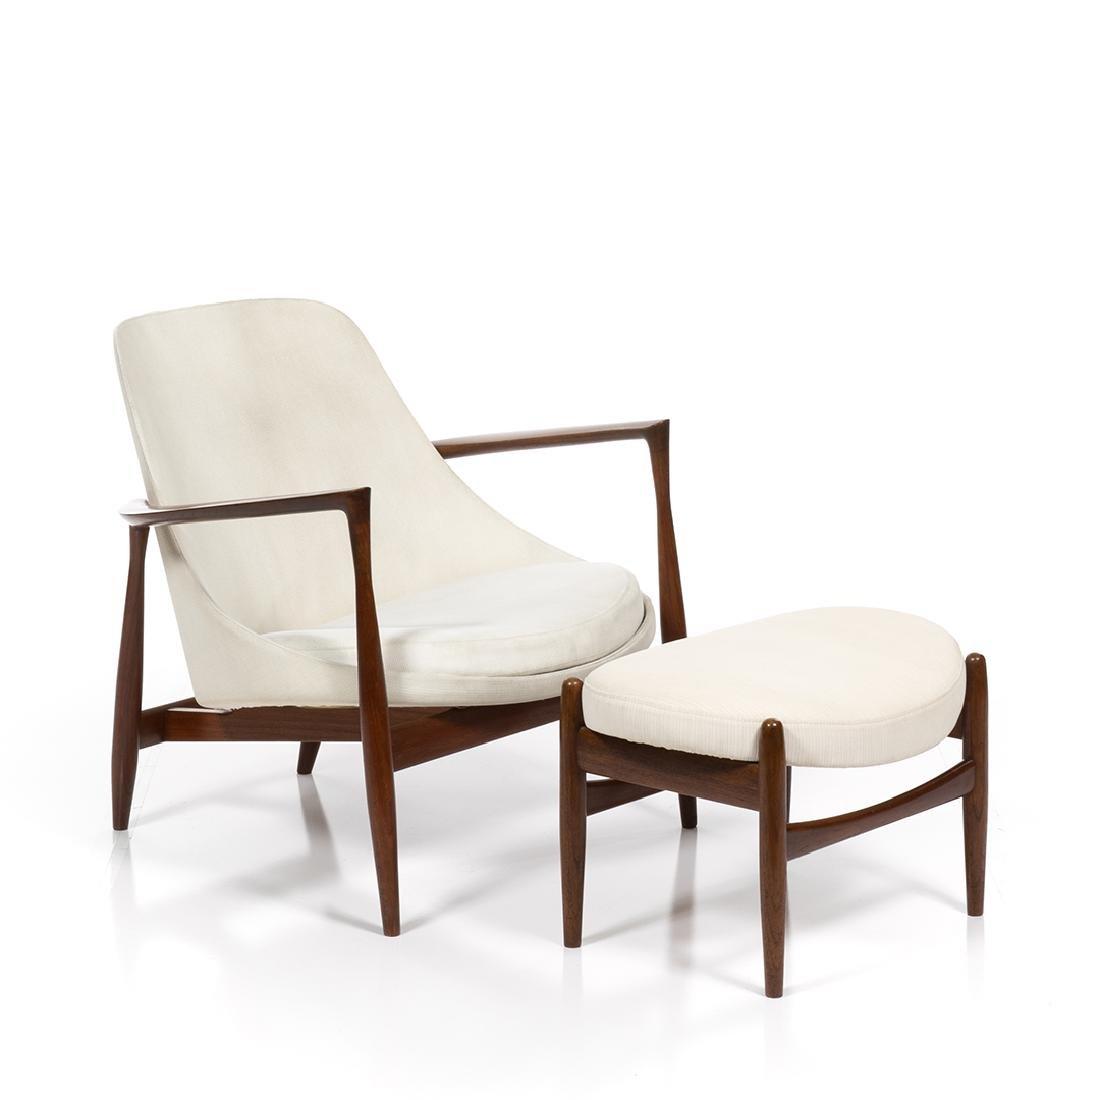 IB Kofod Larsen Elizabeth Chairs - 8